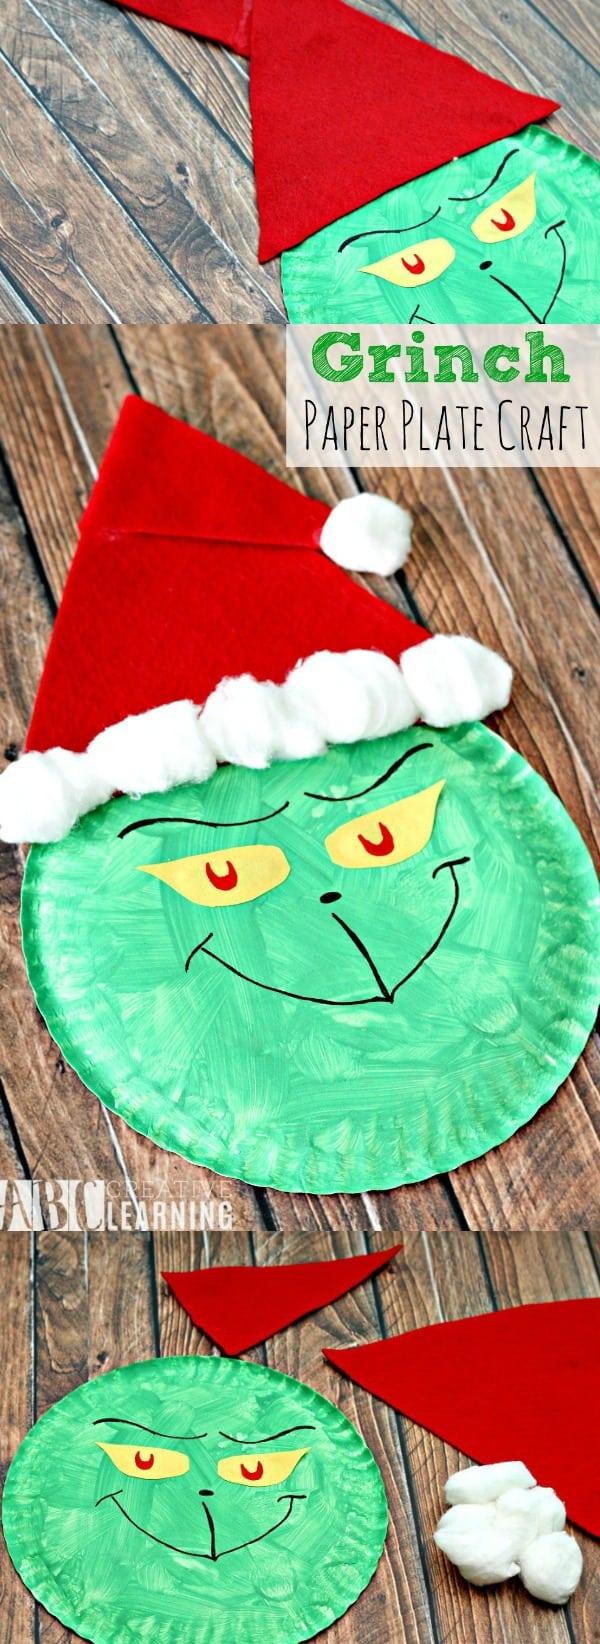 Grinch Paper Plate Craft